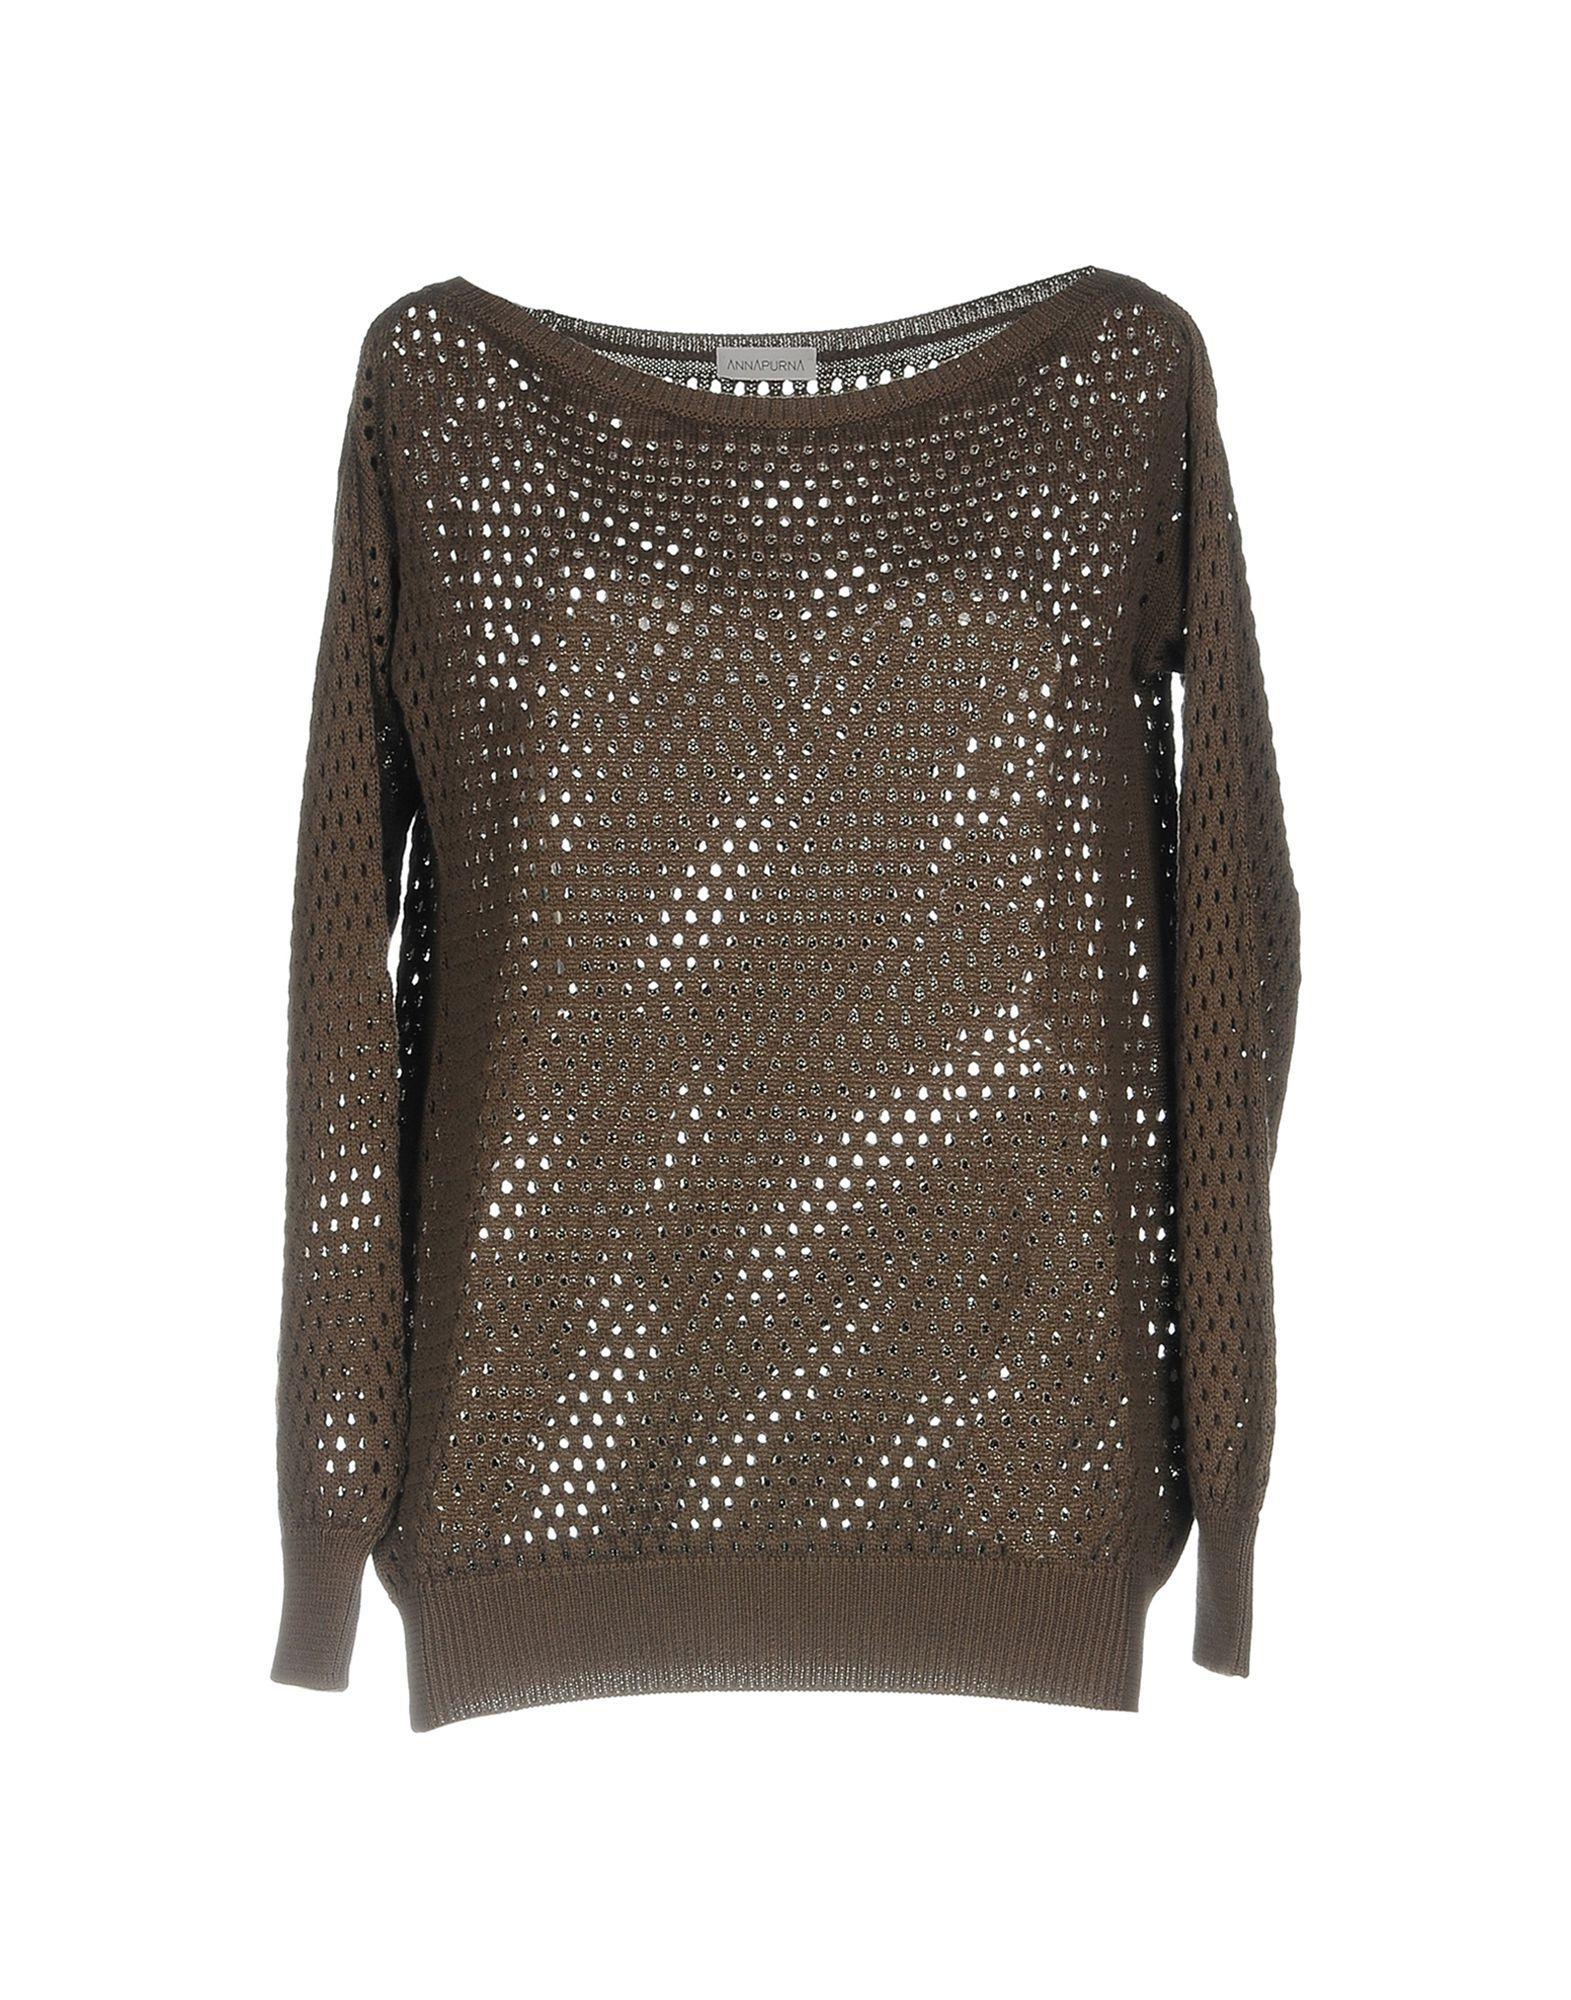 Annapurna Sweater In Dark Brown